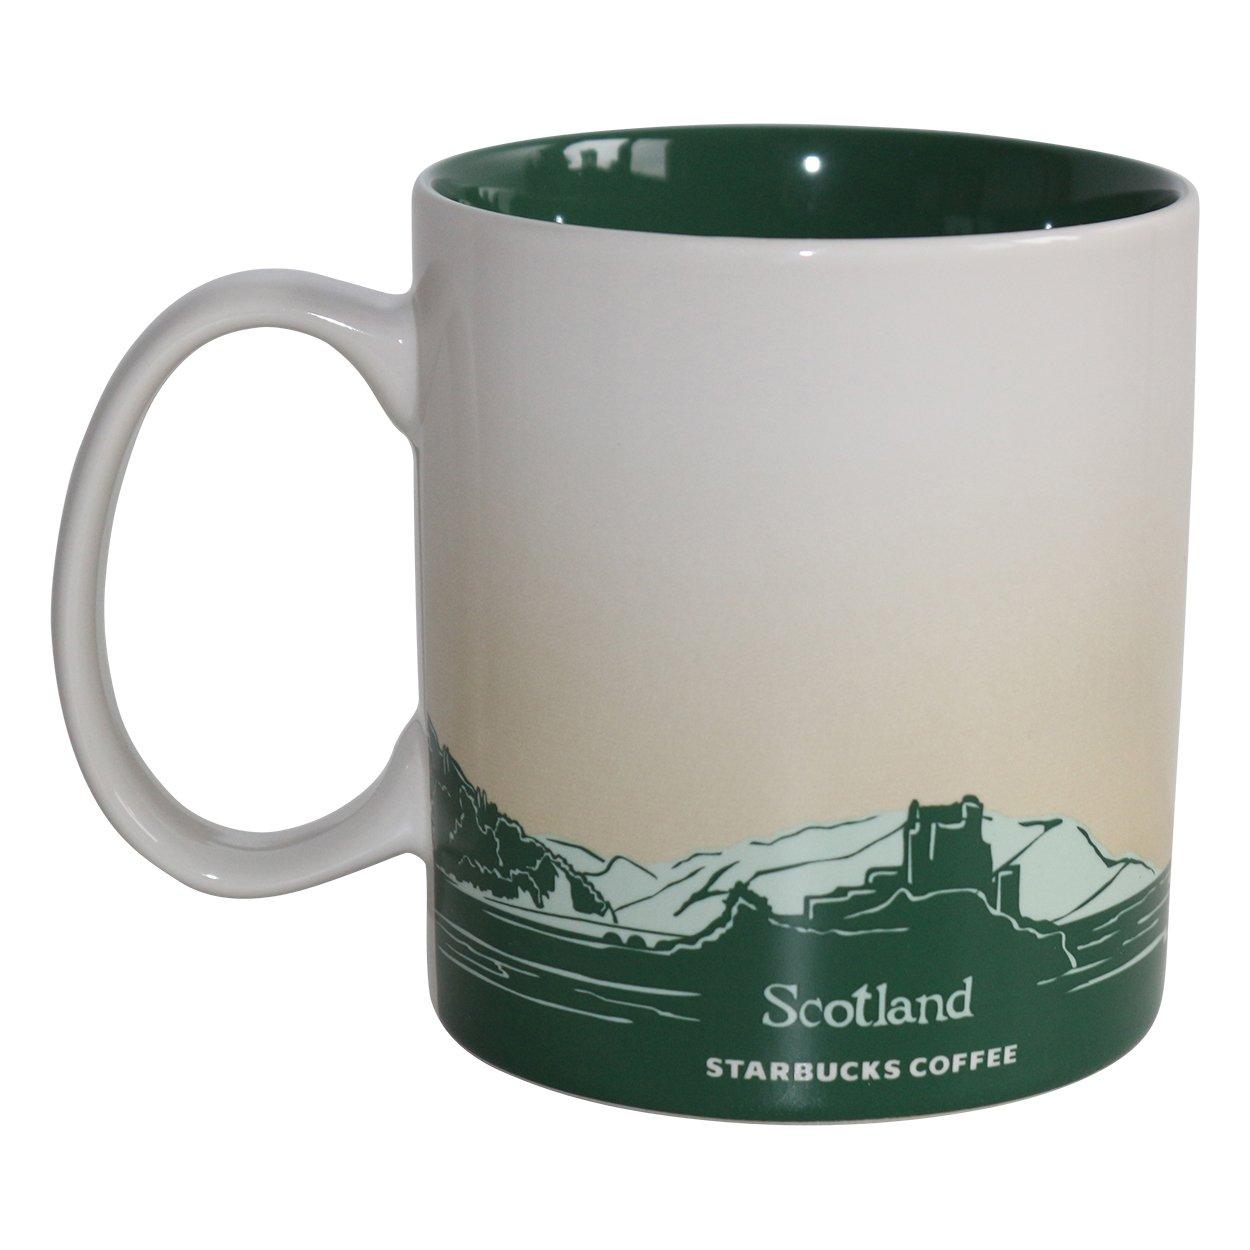 Starbucks City Mug Schottland Scotland: Amazon.de: Küche & Haushalt